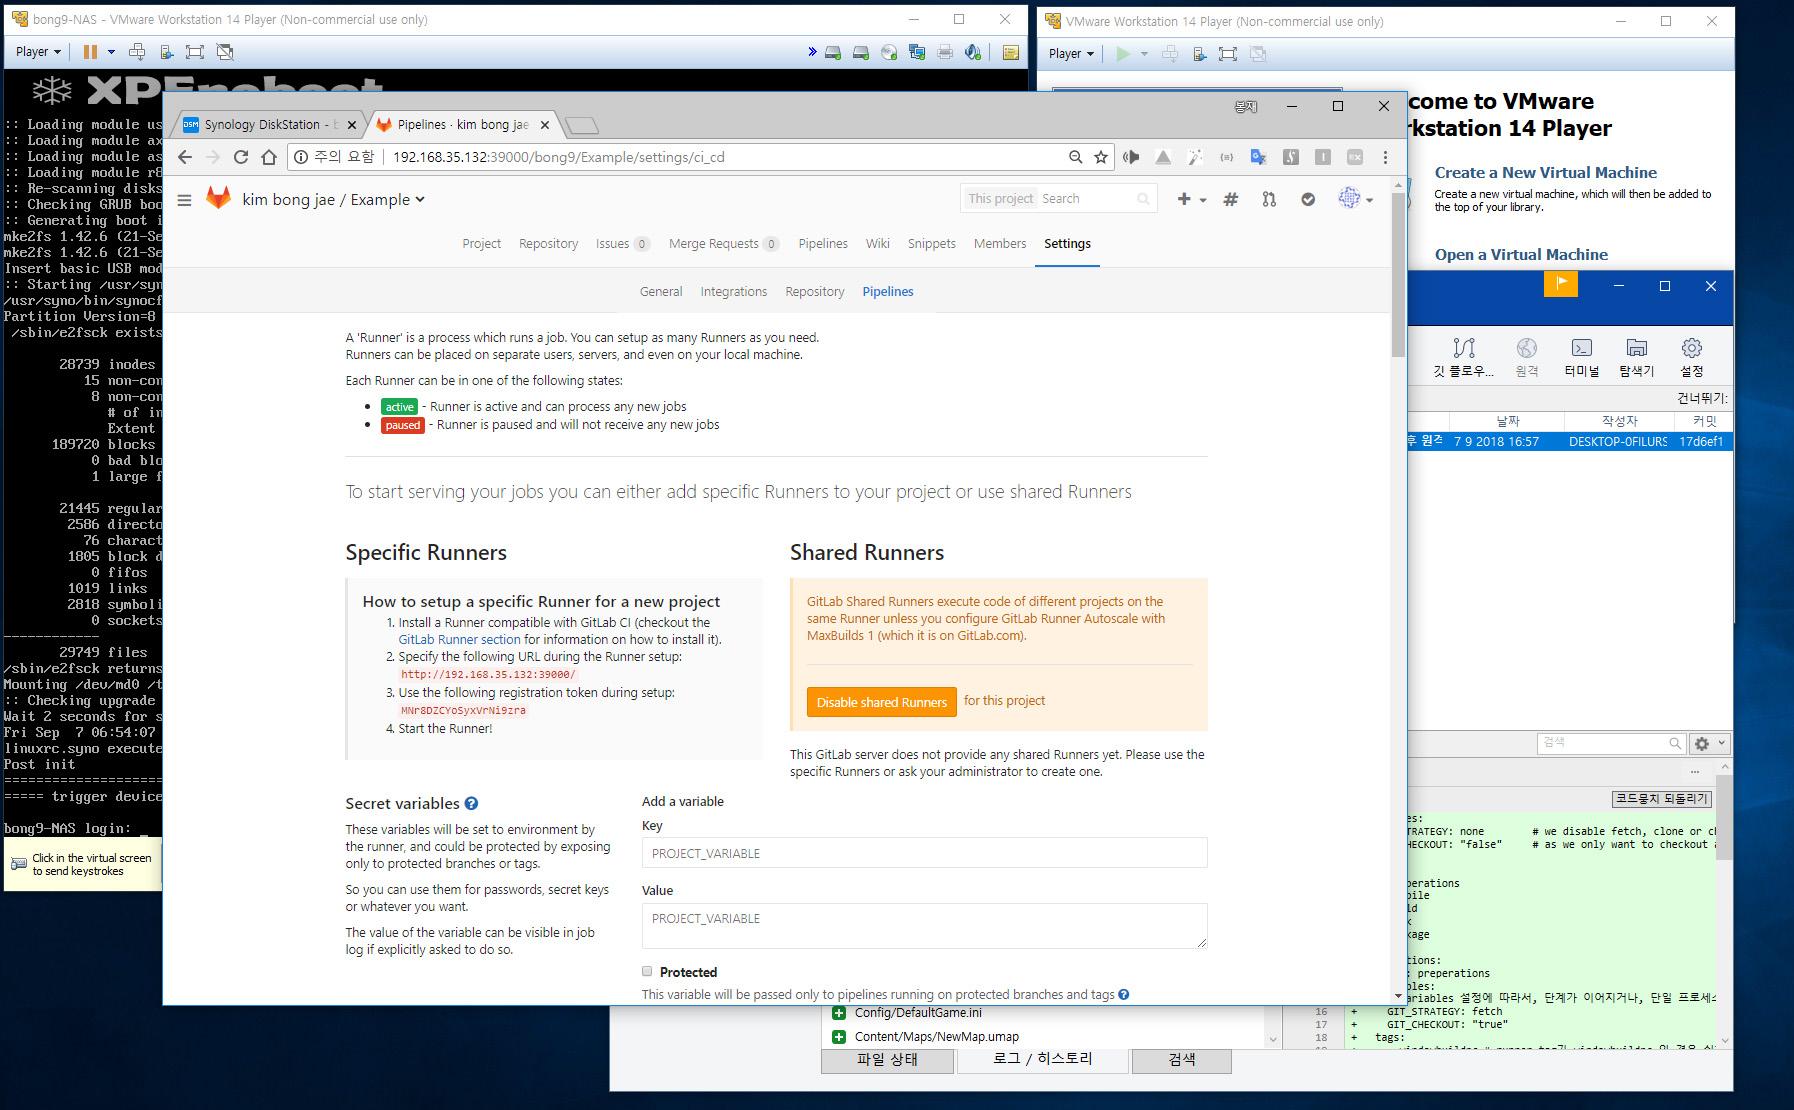 Git 원격 레포지토리 설정 및 SourceTree 를 사용하여 UE4